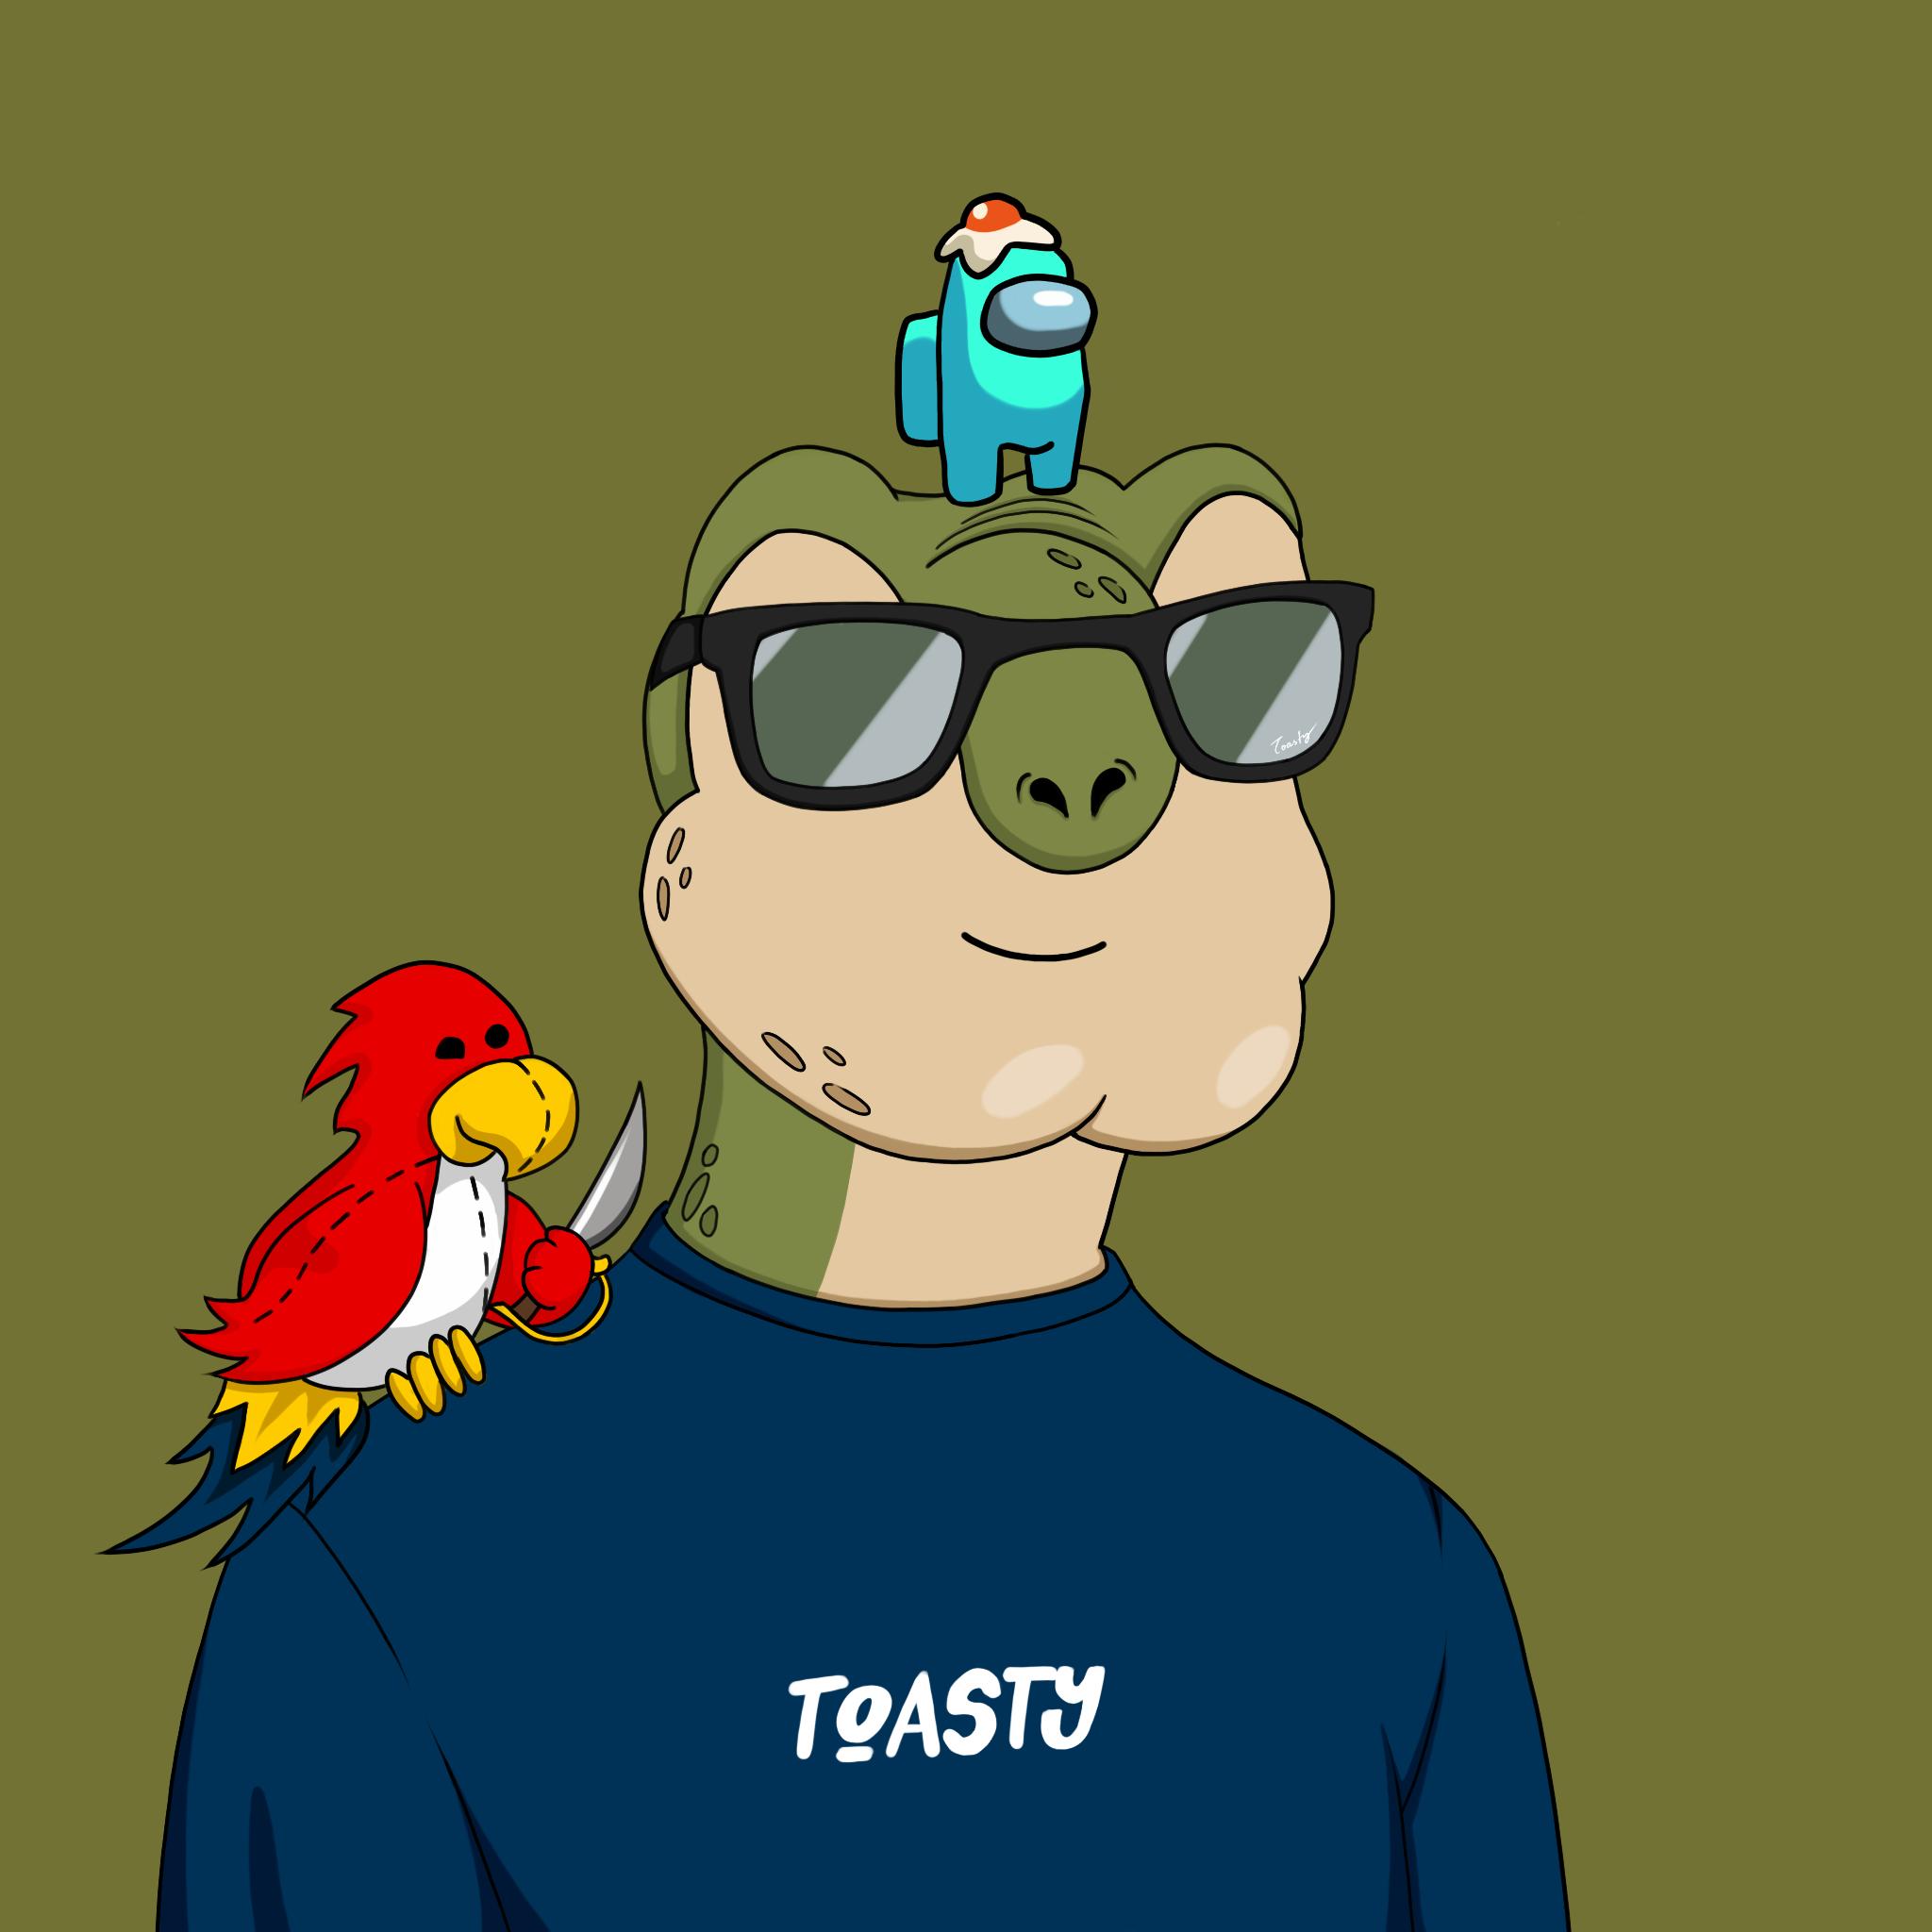 Toasy Turts #3337